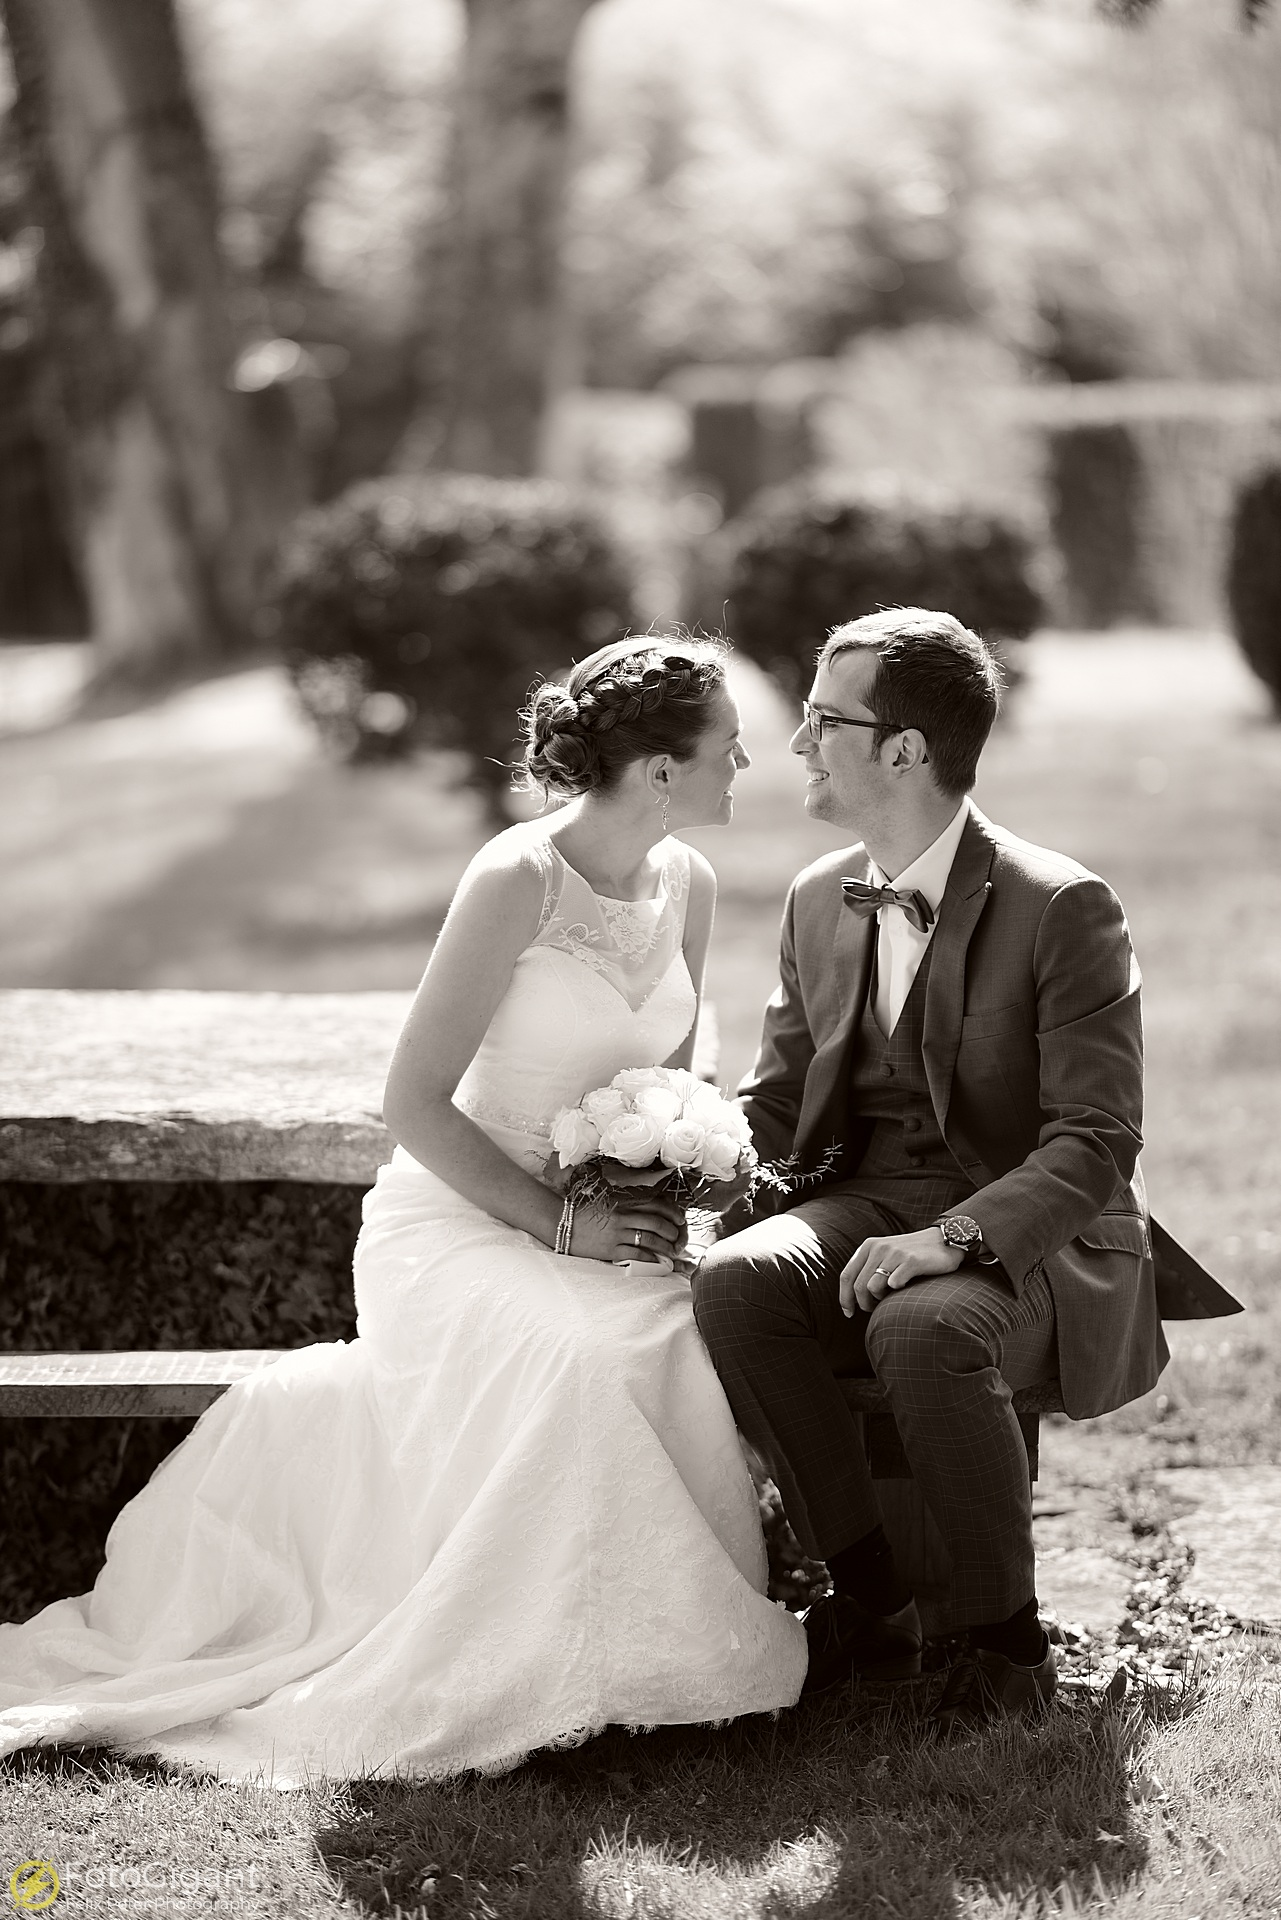 Hochzeitsfotografiekurs_Fotograf_Felix_Peter_28.jpg